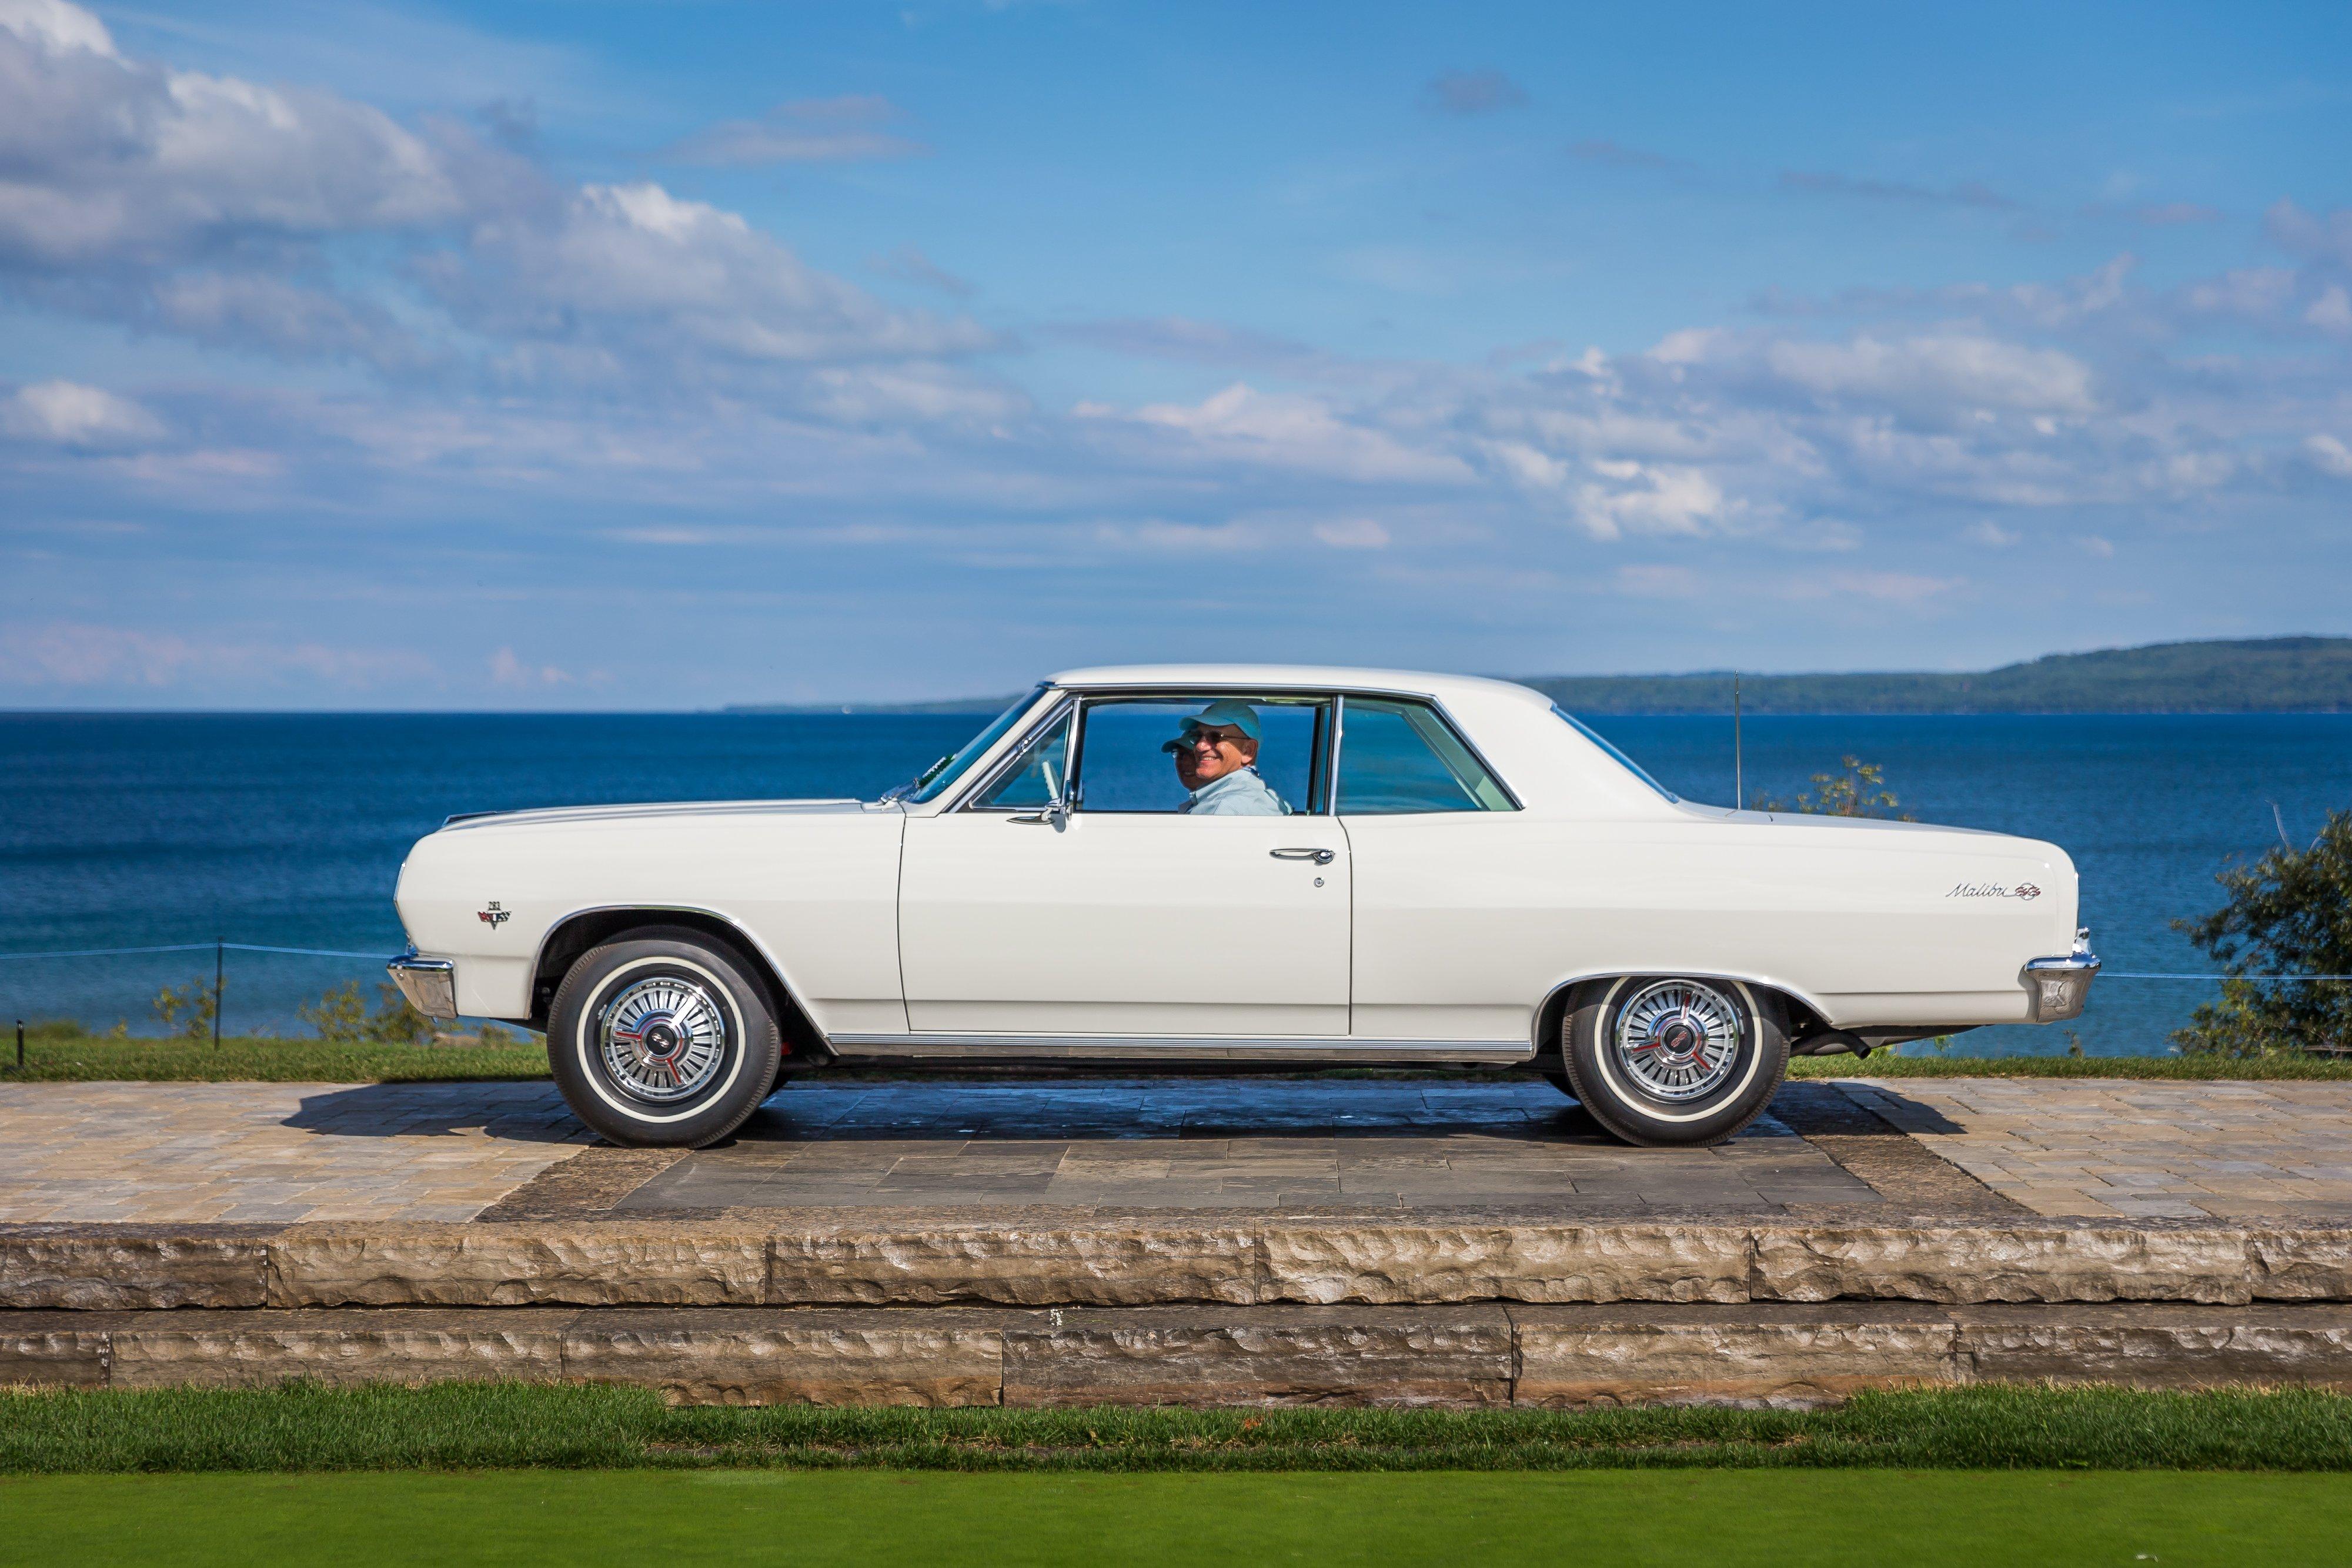 1965 Chev Chevelle Malibu SS- 3rd